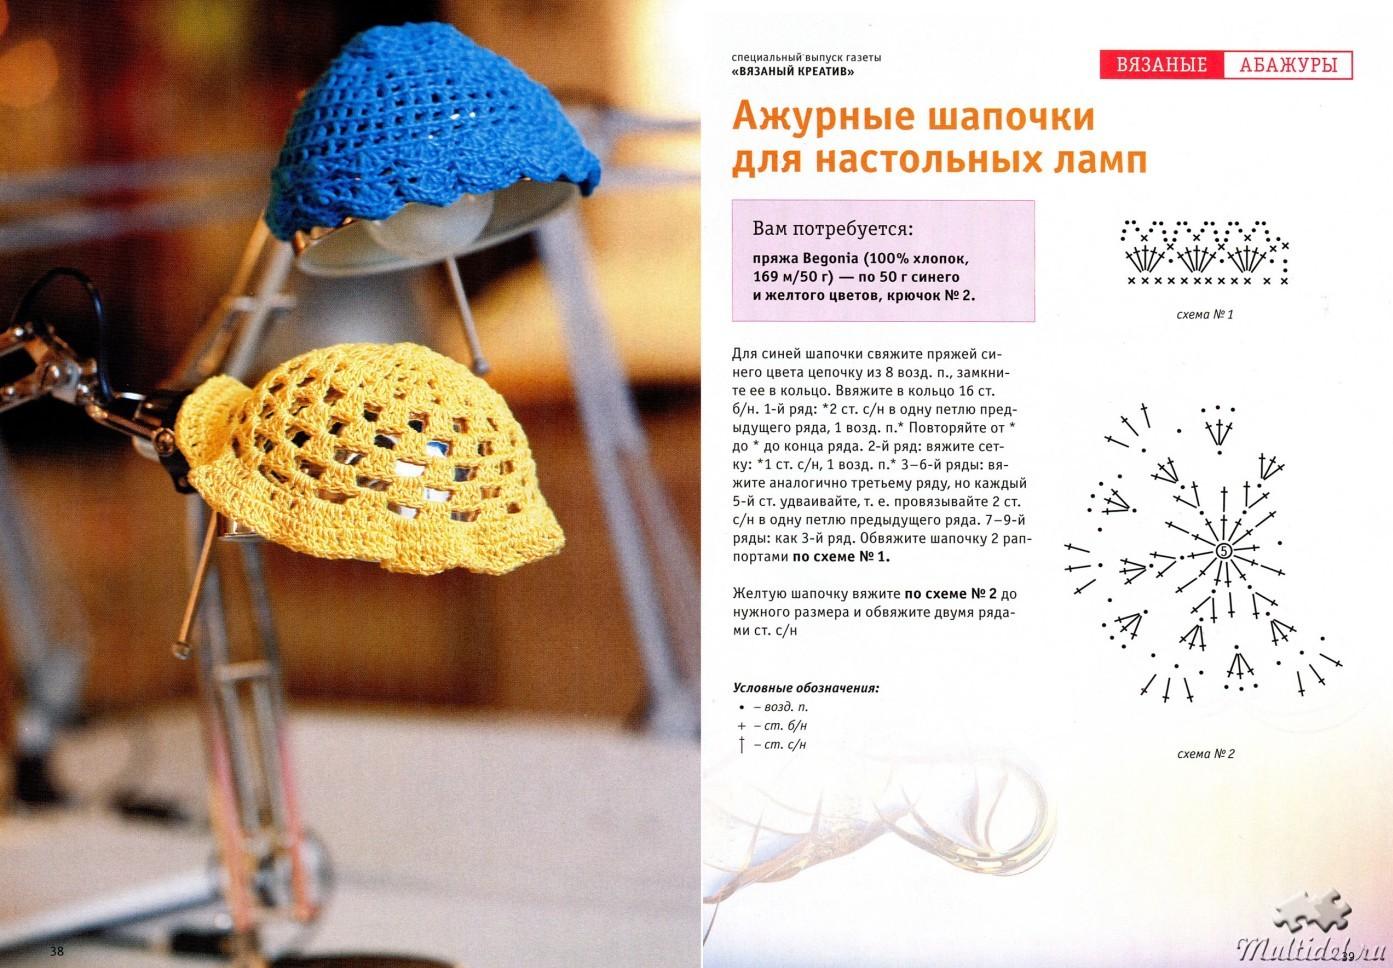 Ажурные шапочки для настольных ламп